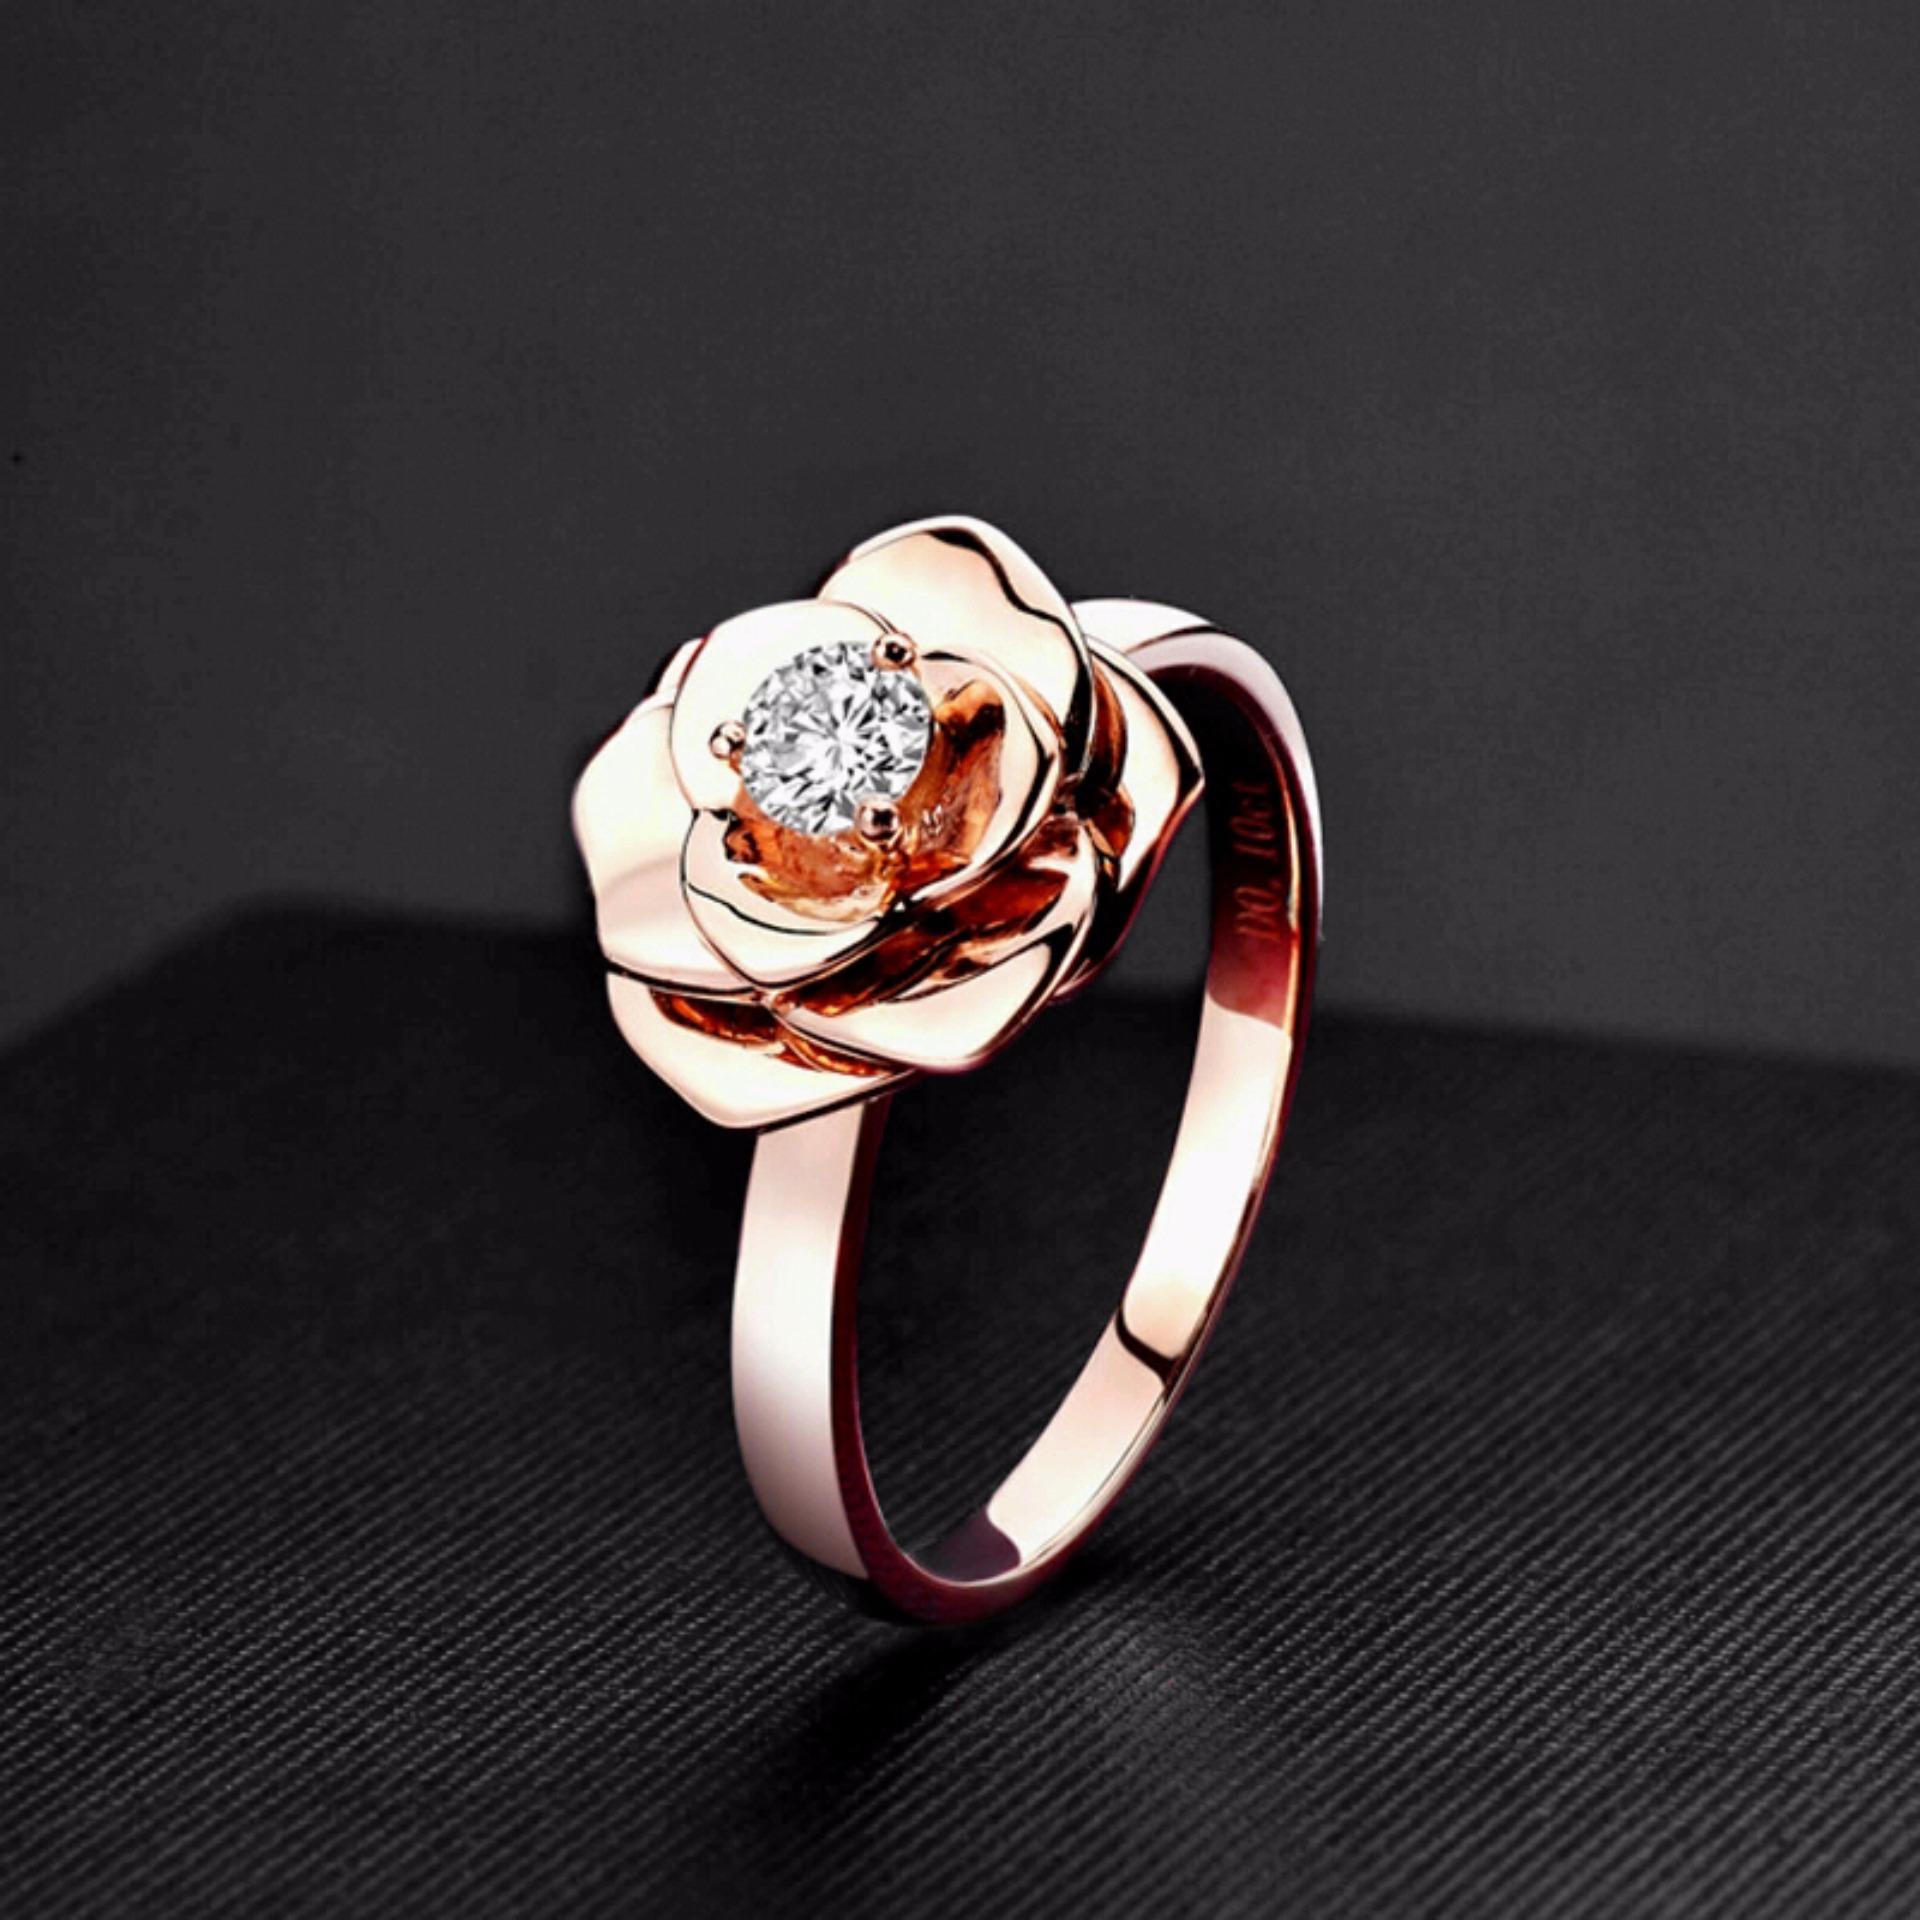 Tempat Jual Lihat Tiaria Djxdz011 Kalung Emas Berlian For Update Rose Ring Cincin Perhiasan Kawin Resplendent Tunangan Wanita 9k With